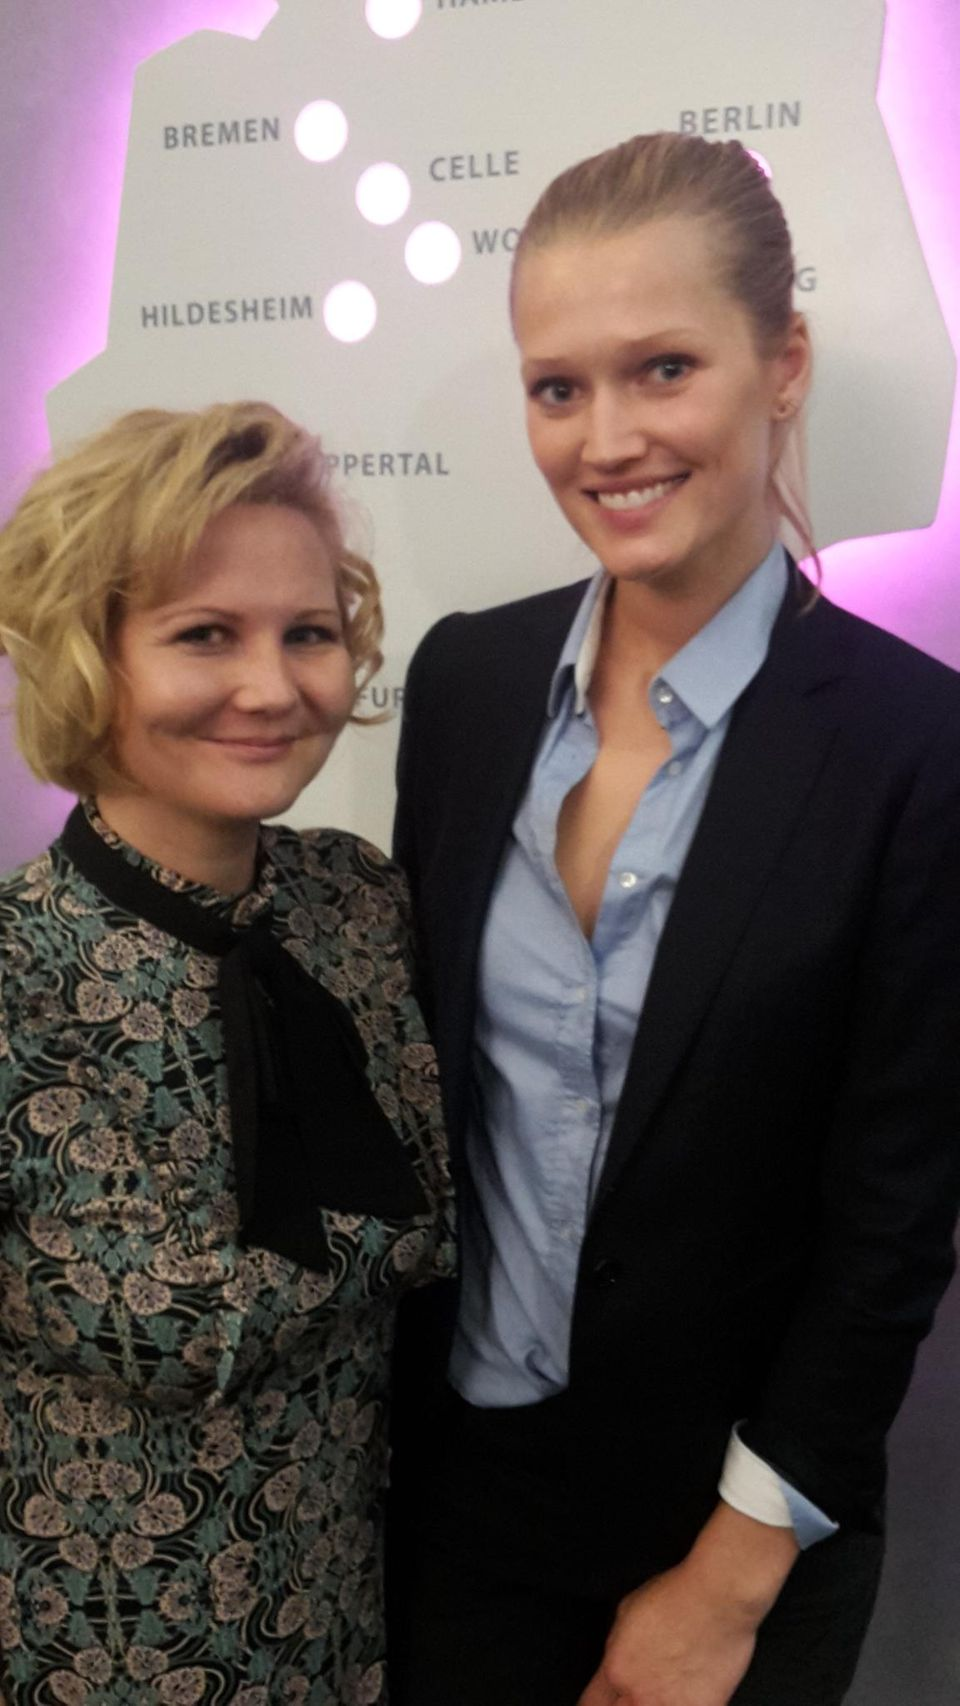 Gala-Redakteurin Jolla sprach mit Toni Garrn